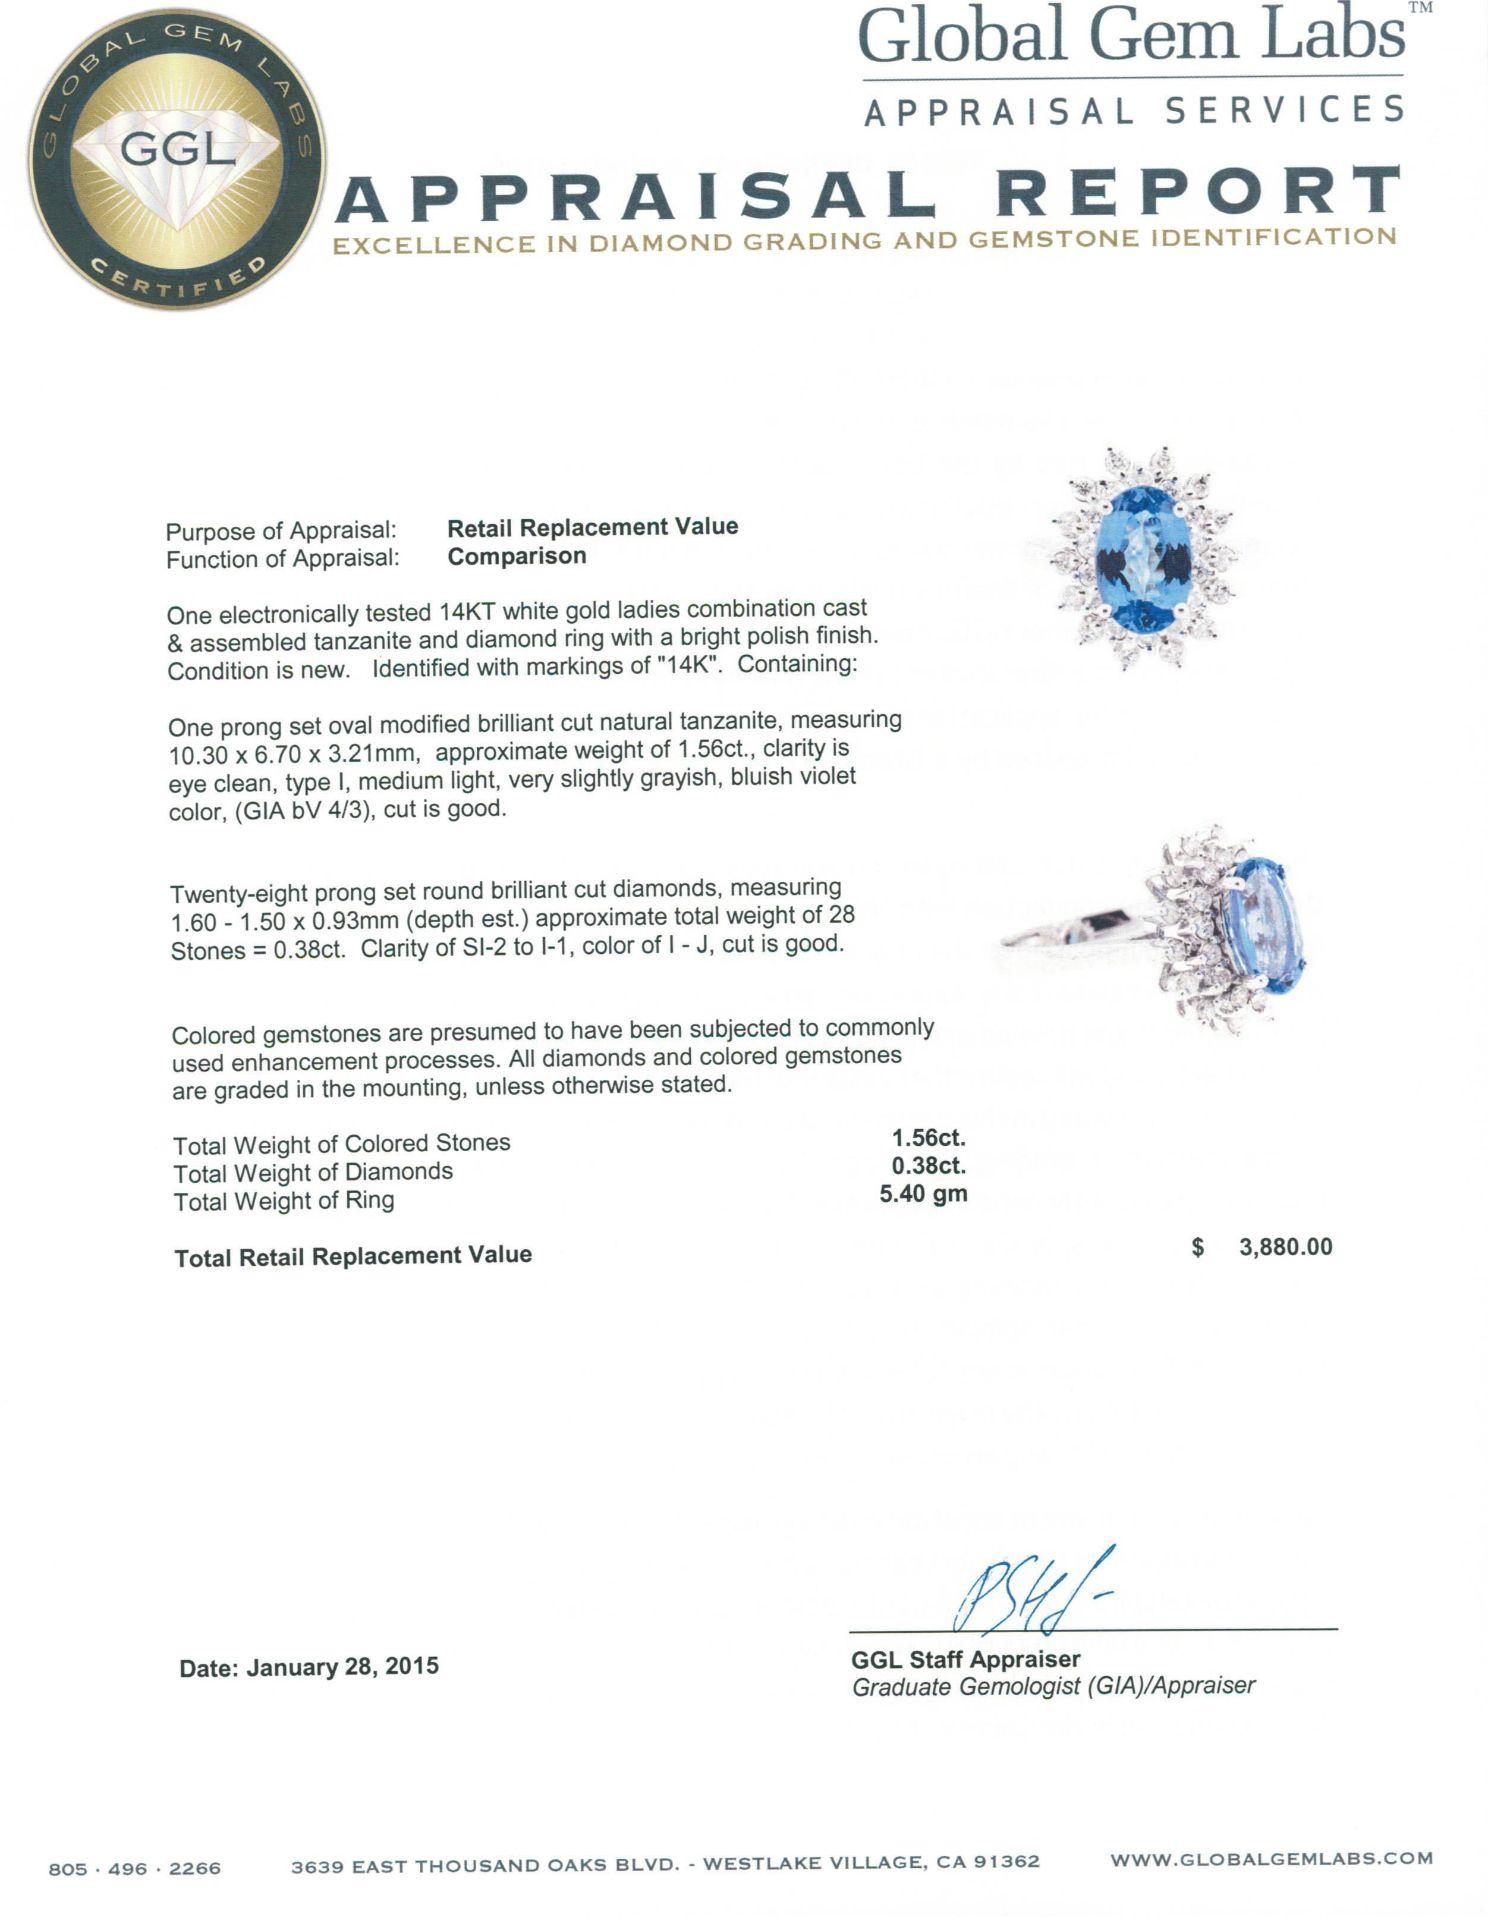 14KT White Gold 1.56 ctw Tanzanite and Diamond Ring - Image 5 of 5